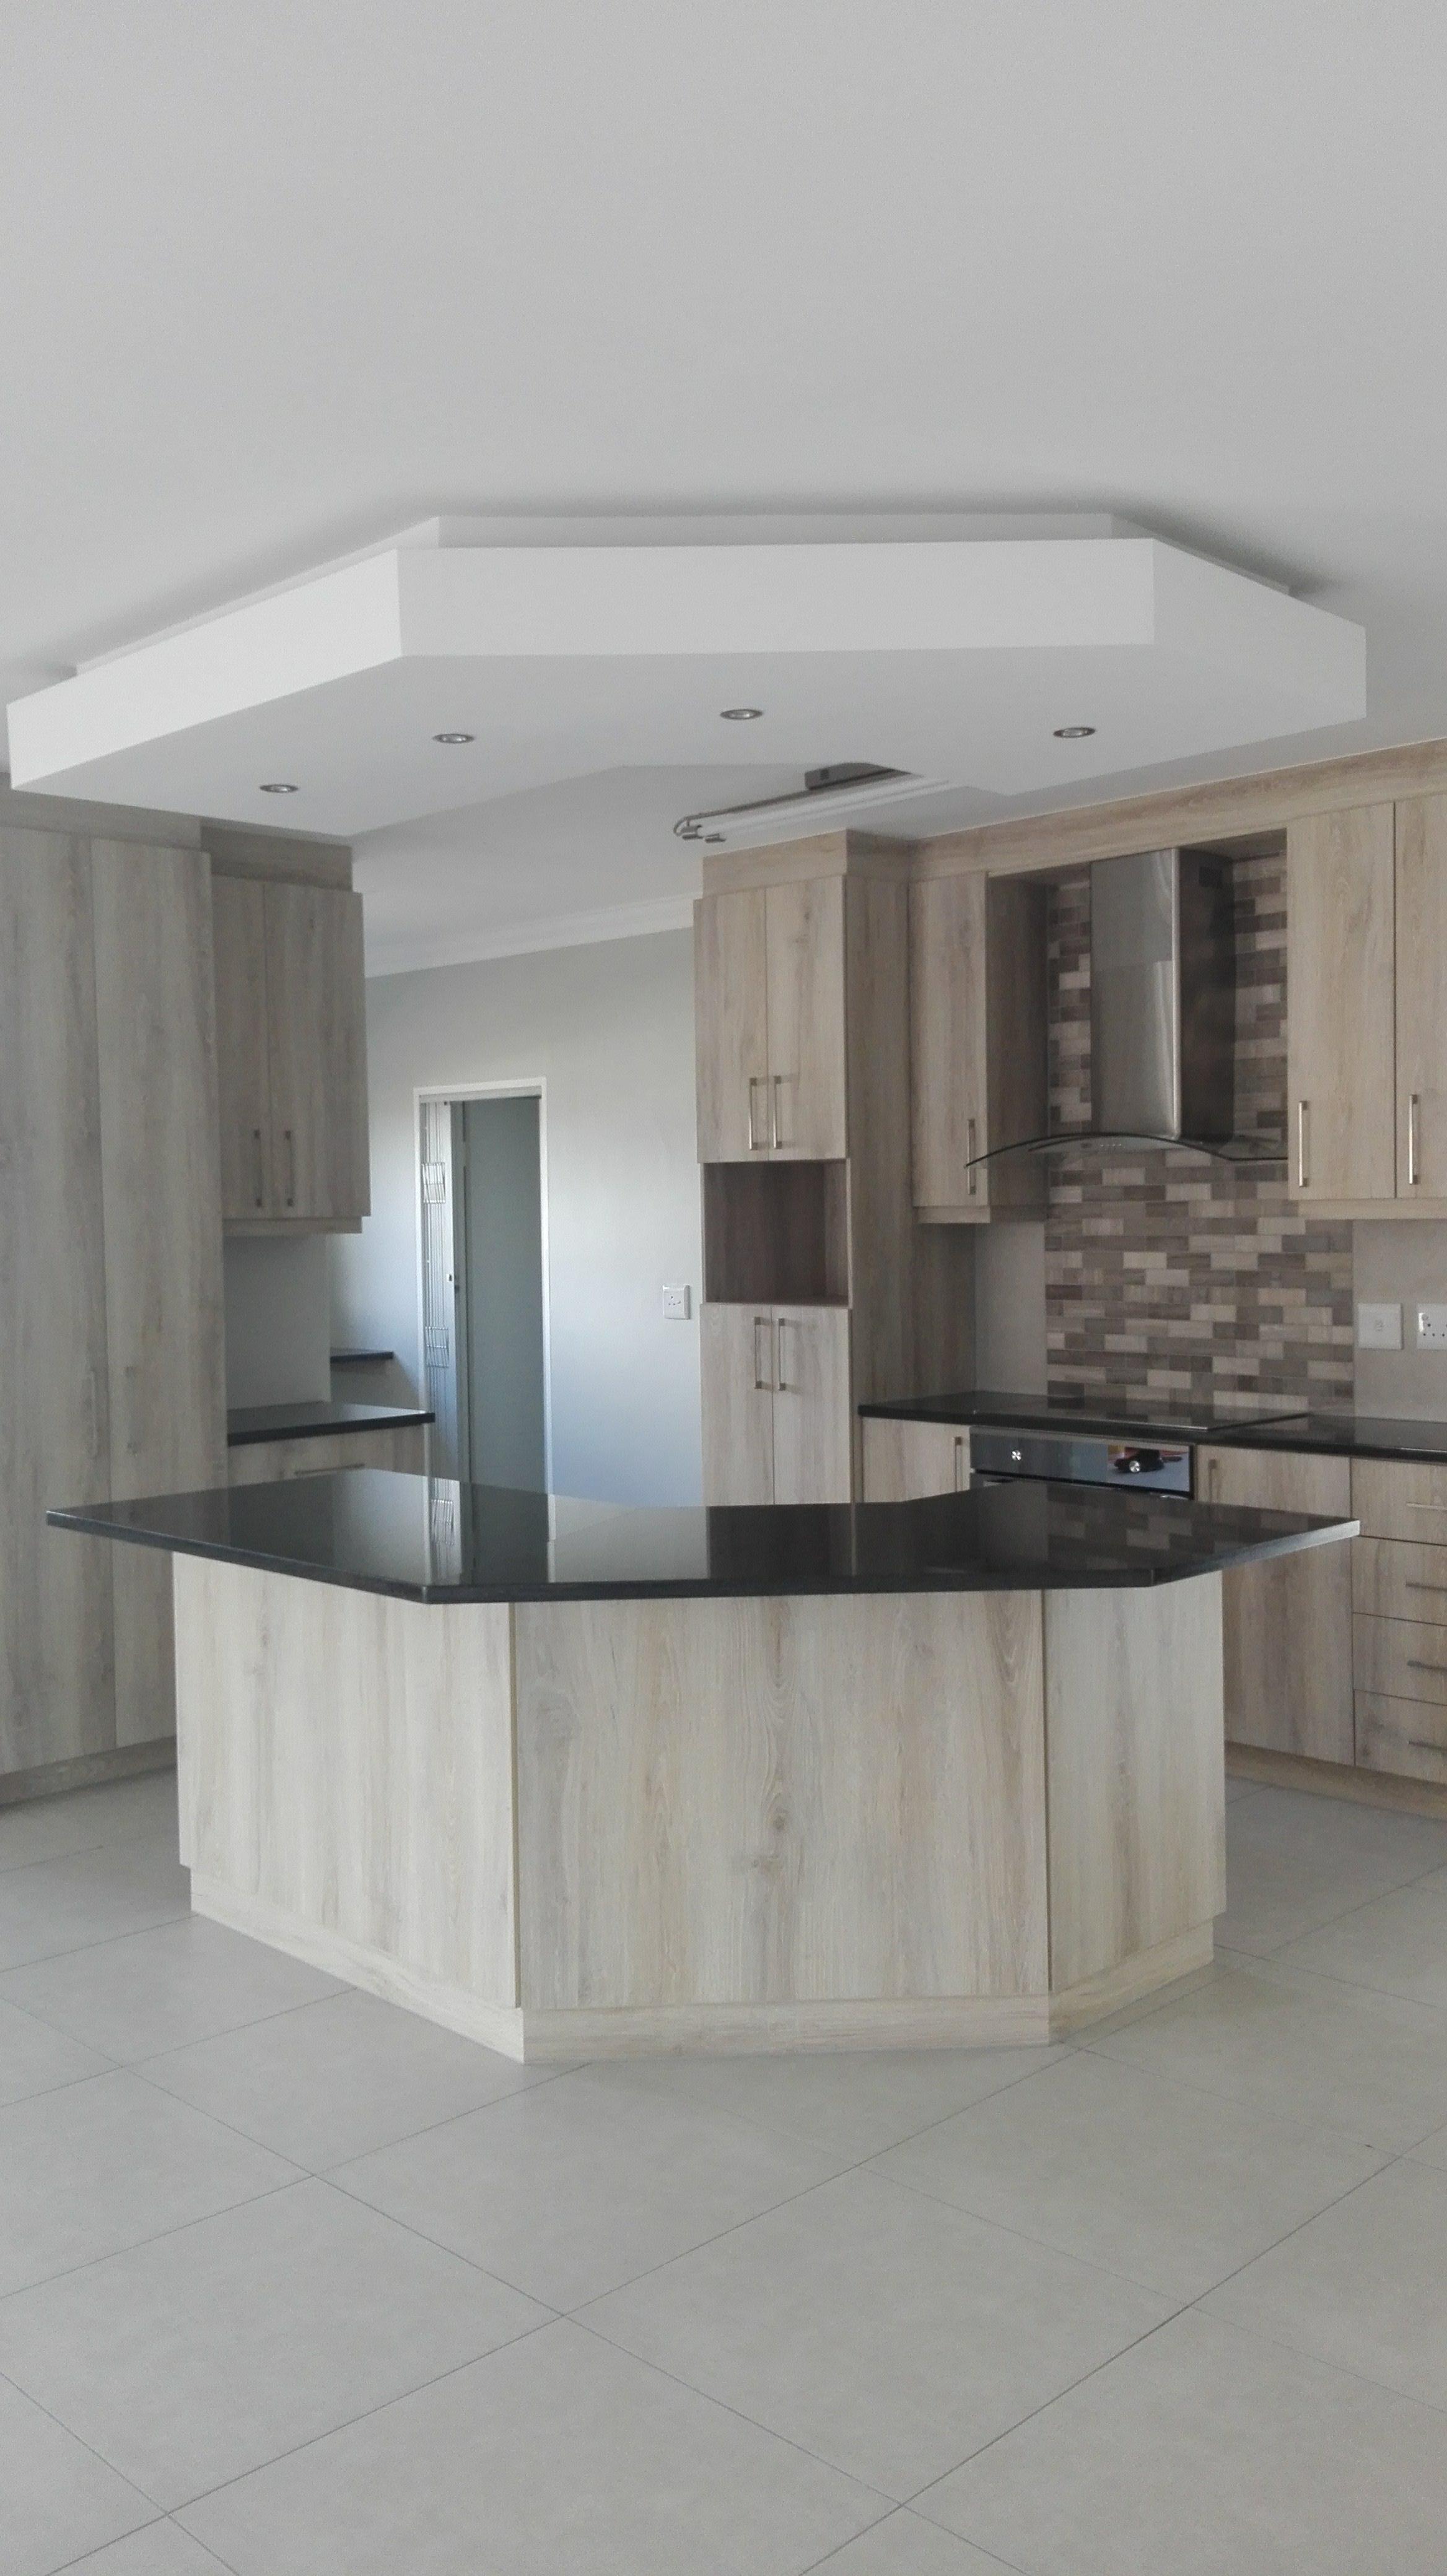 House Brand, Brackenfell, Kwali Mark Construction, Brackenfell, Western Cape